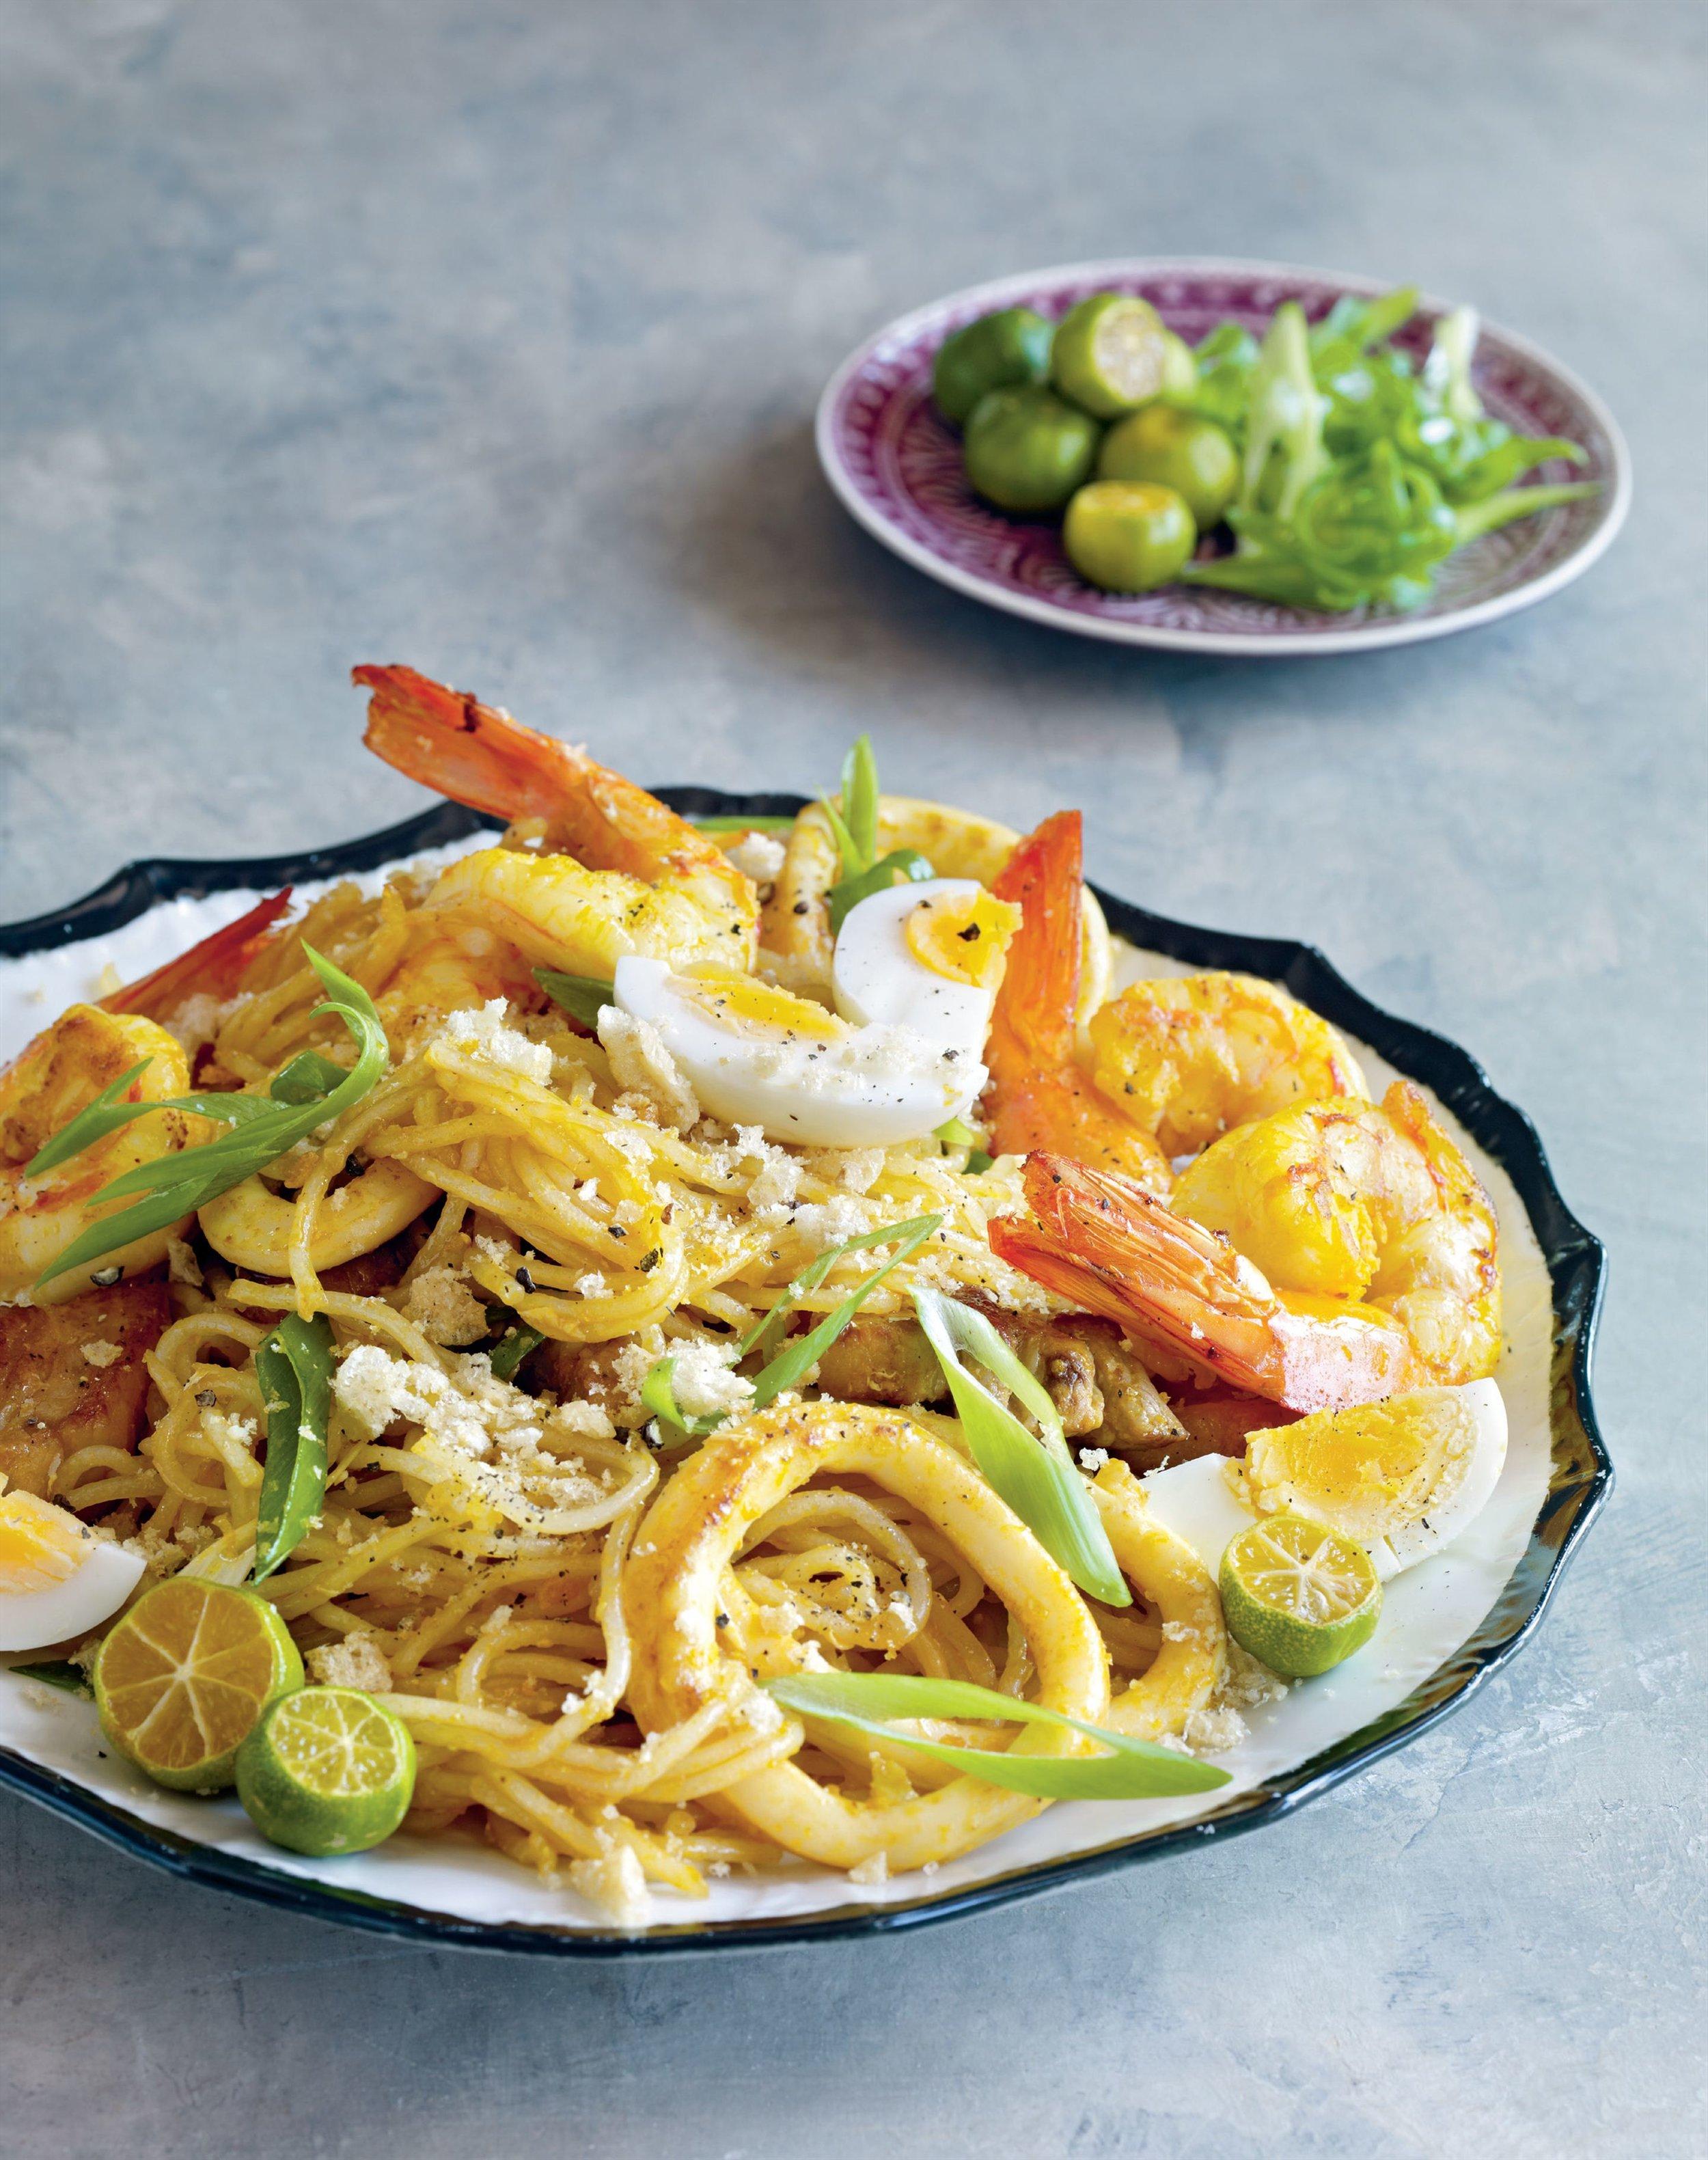 Pancit palabok   7000 Islands cookbook